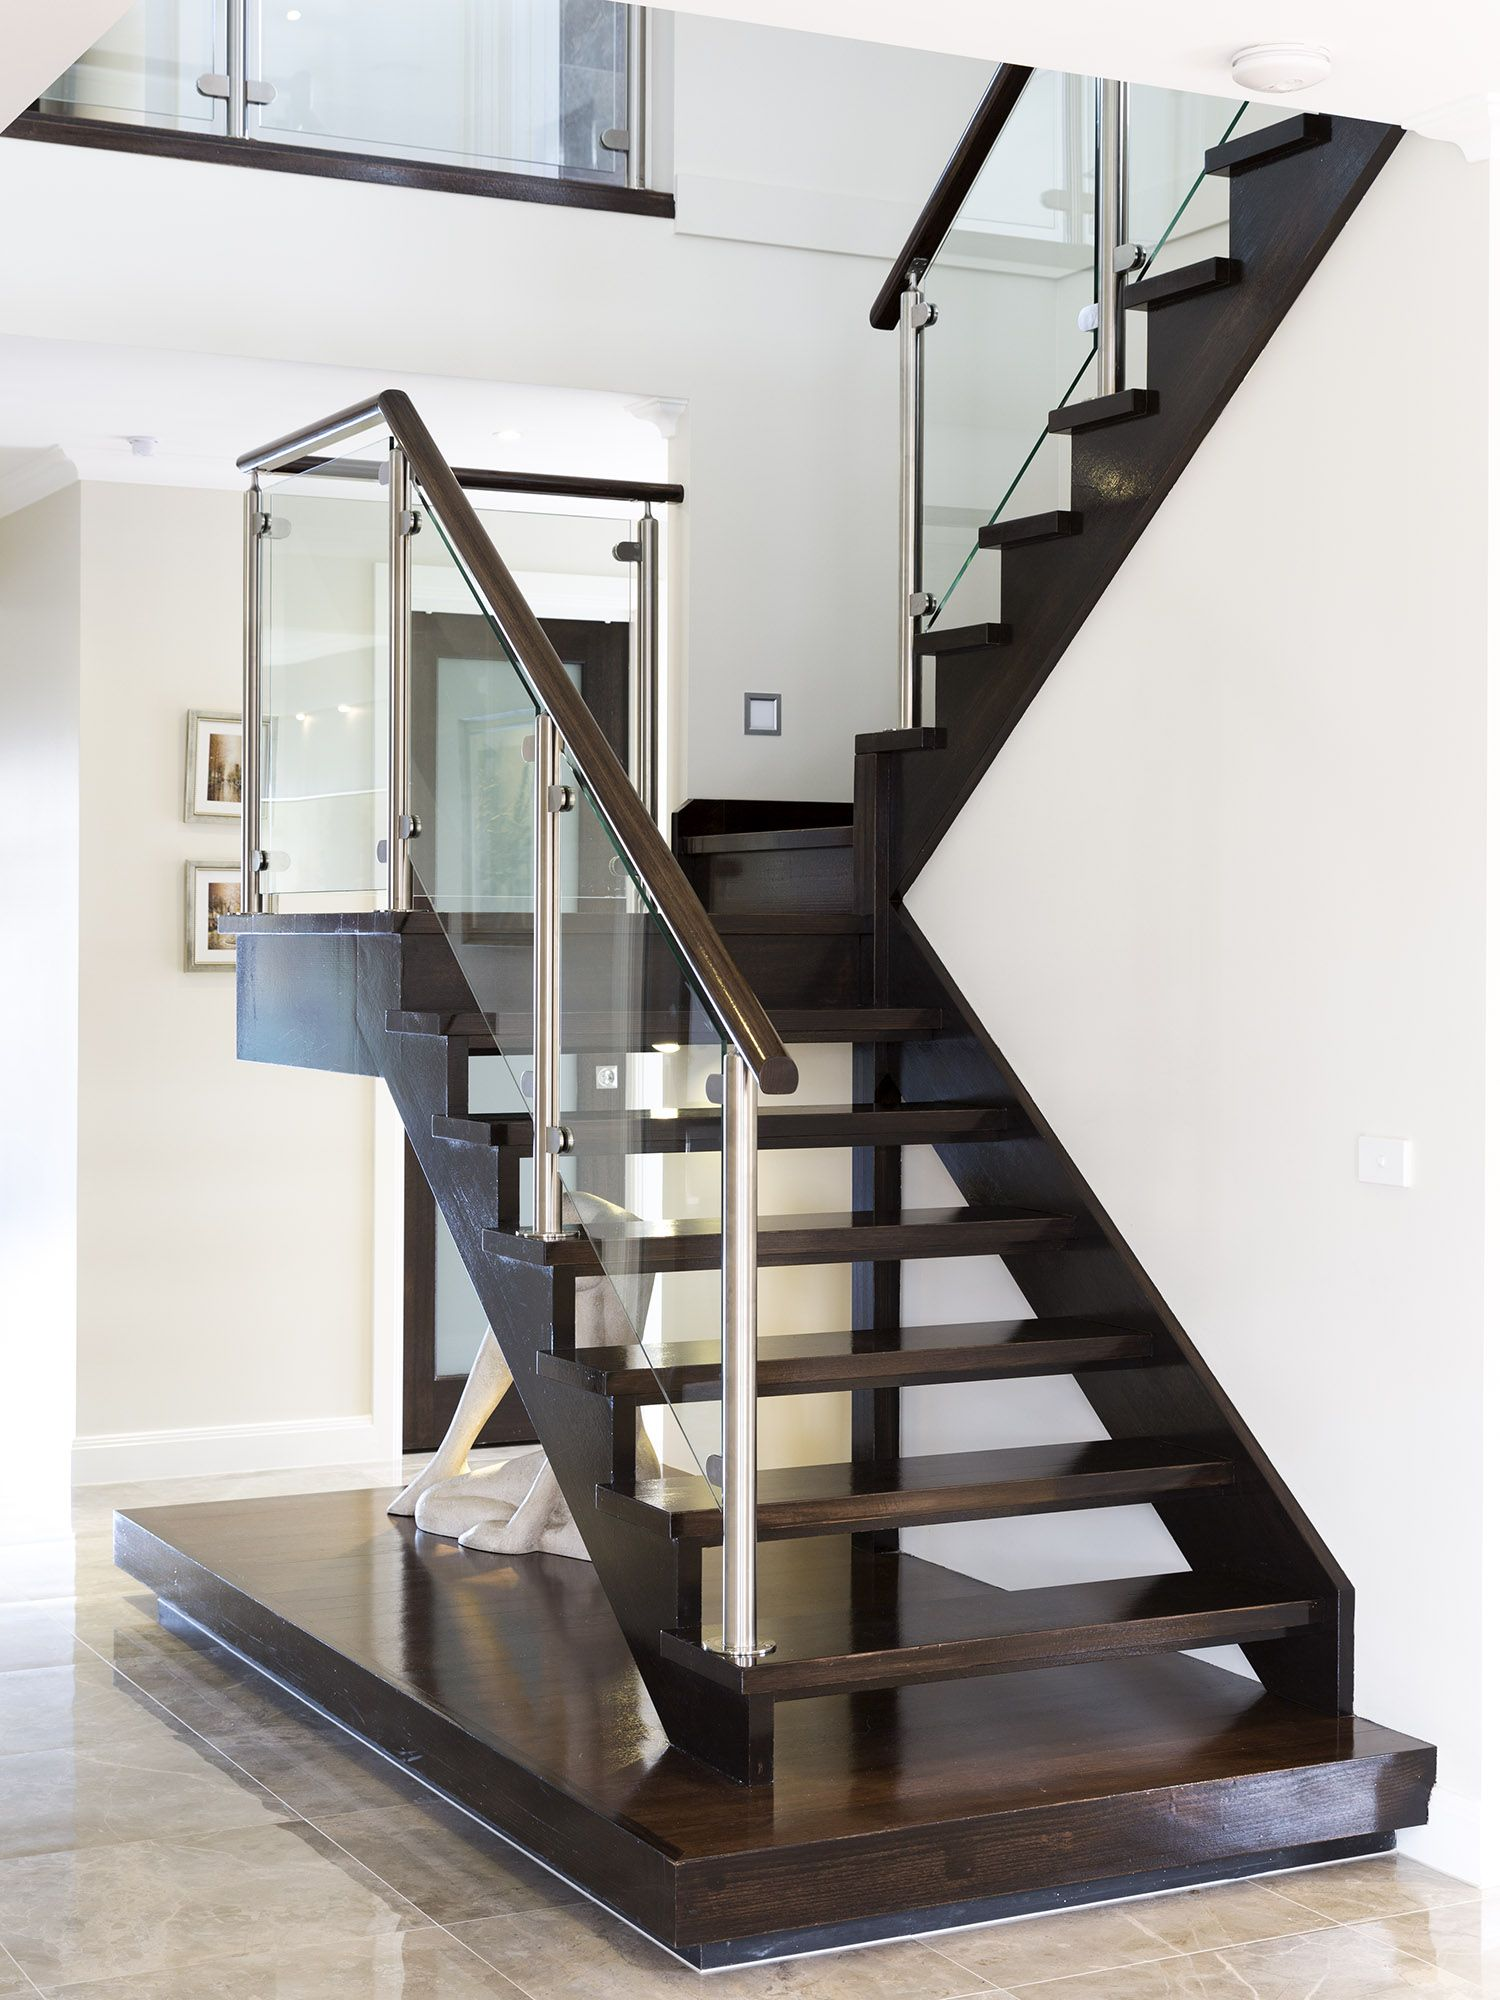 Modern | Stair | Stairs | Design | Australia | Melbourne | Balustrade |  Open Flight